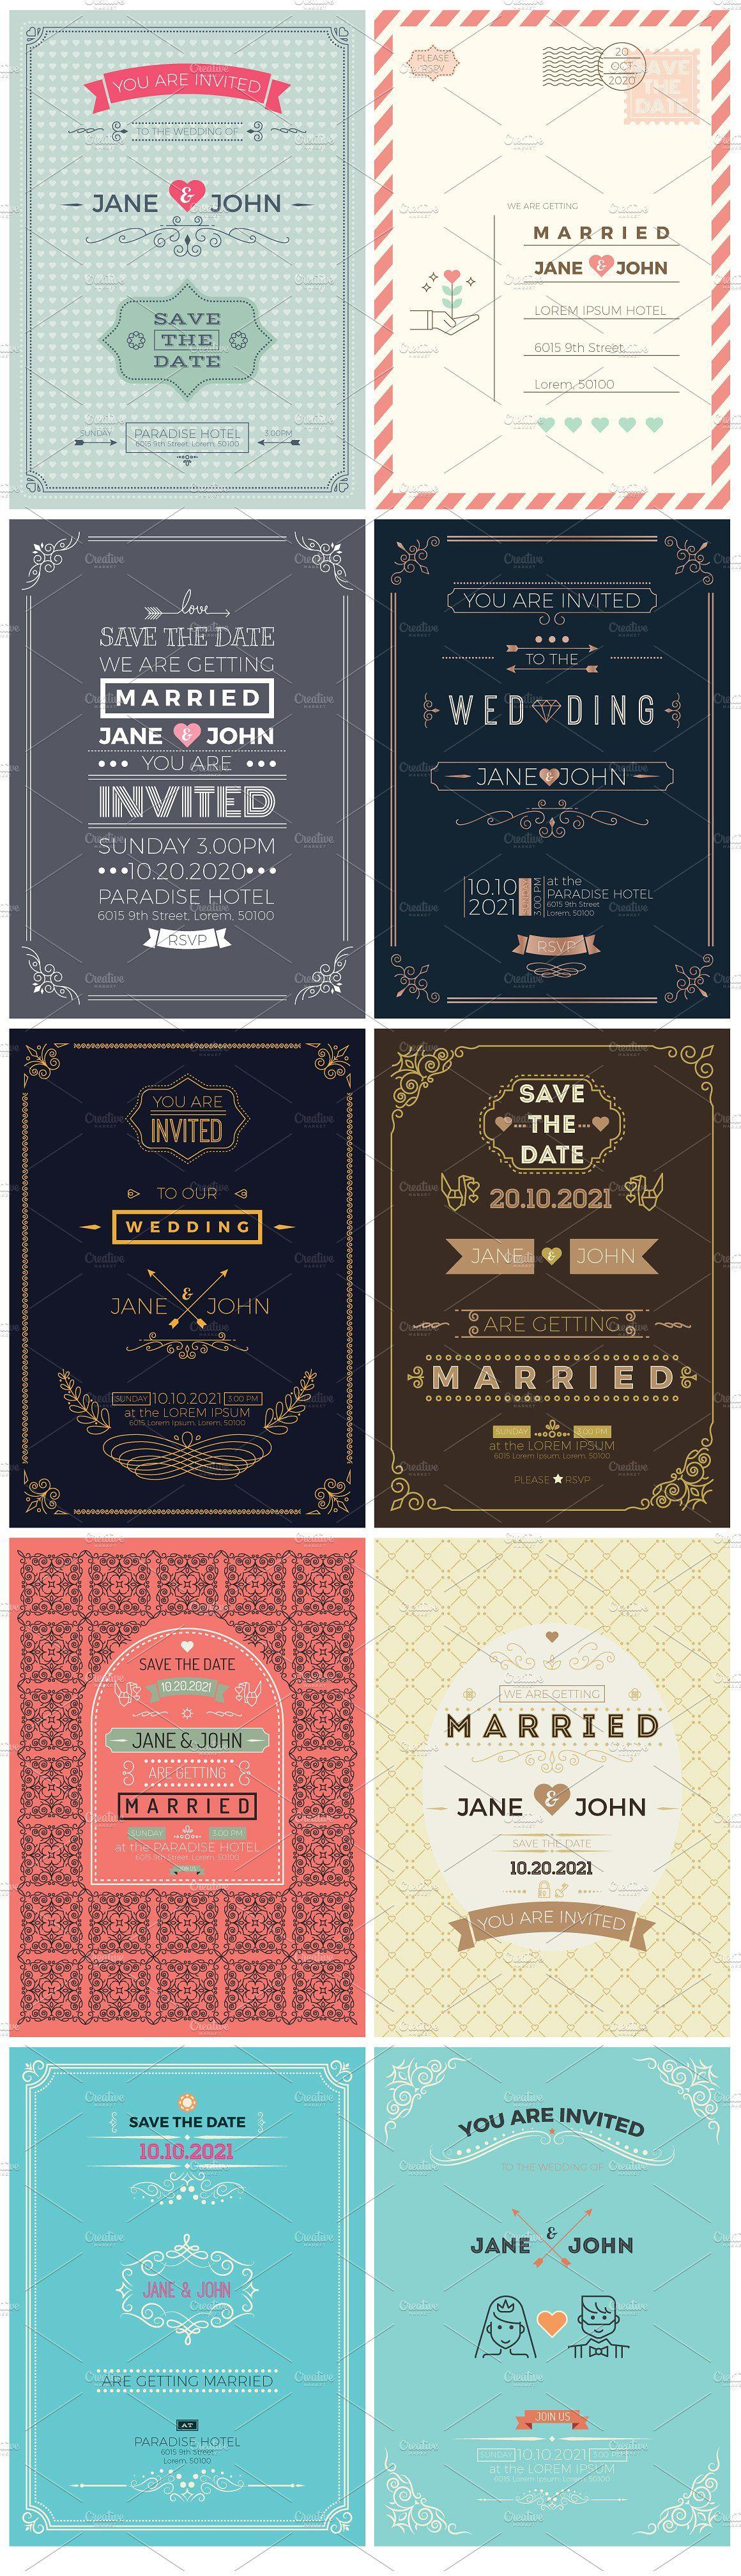 30 Wedding Invitations Value Pack Wedding Invitation Card Template Wedding Invitation Cards Wedding Card Templates